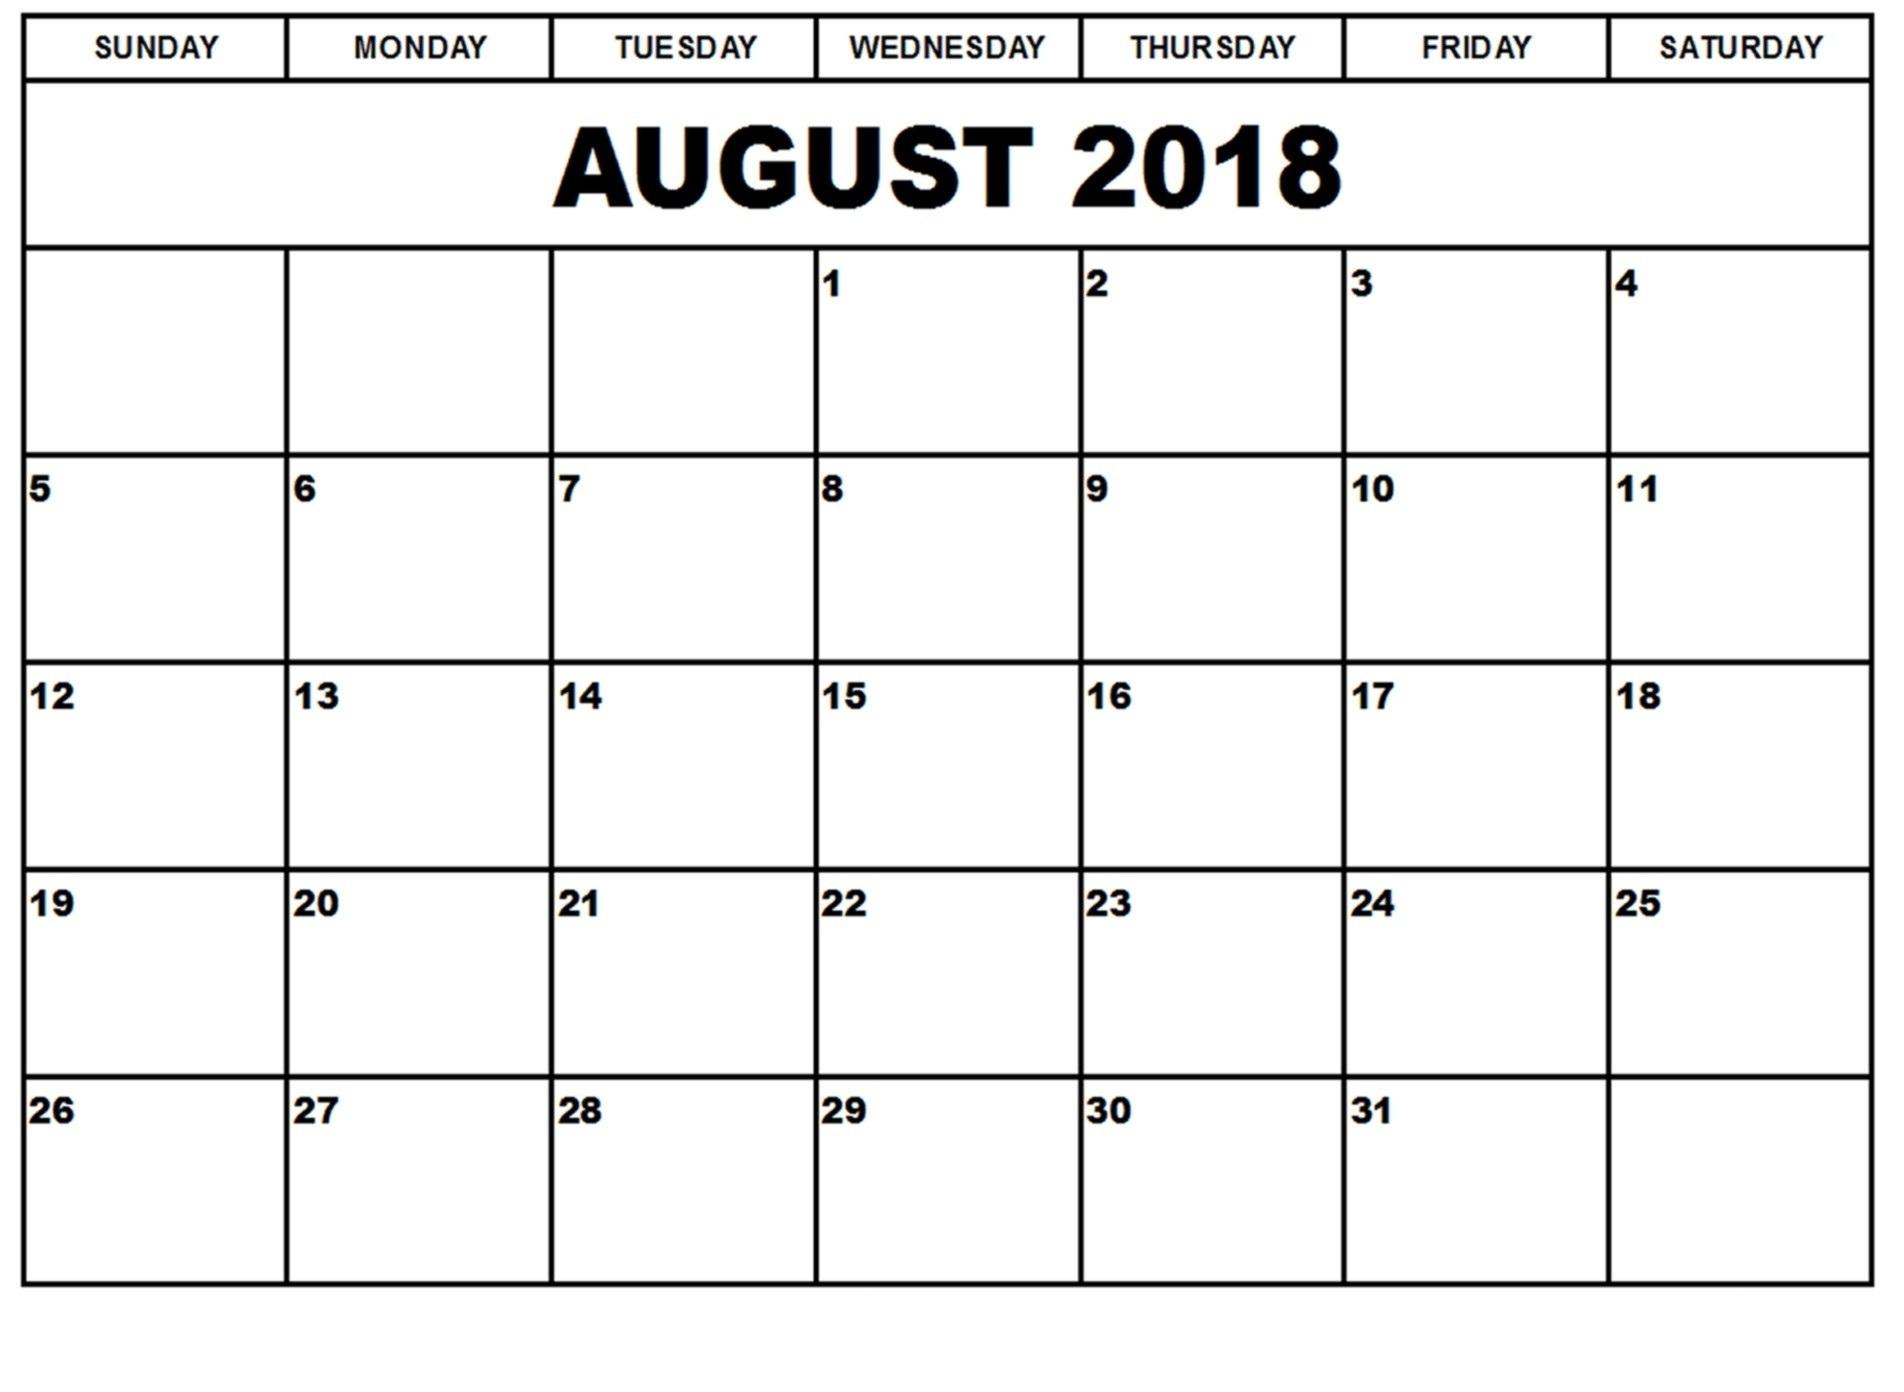 Printable August 2018 Blank Calendarday